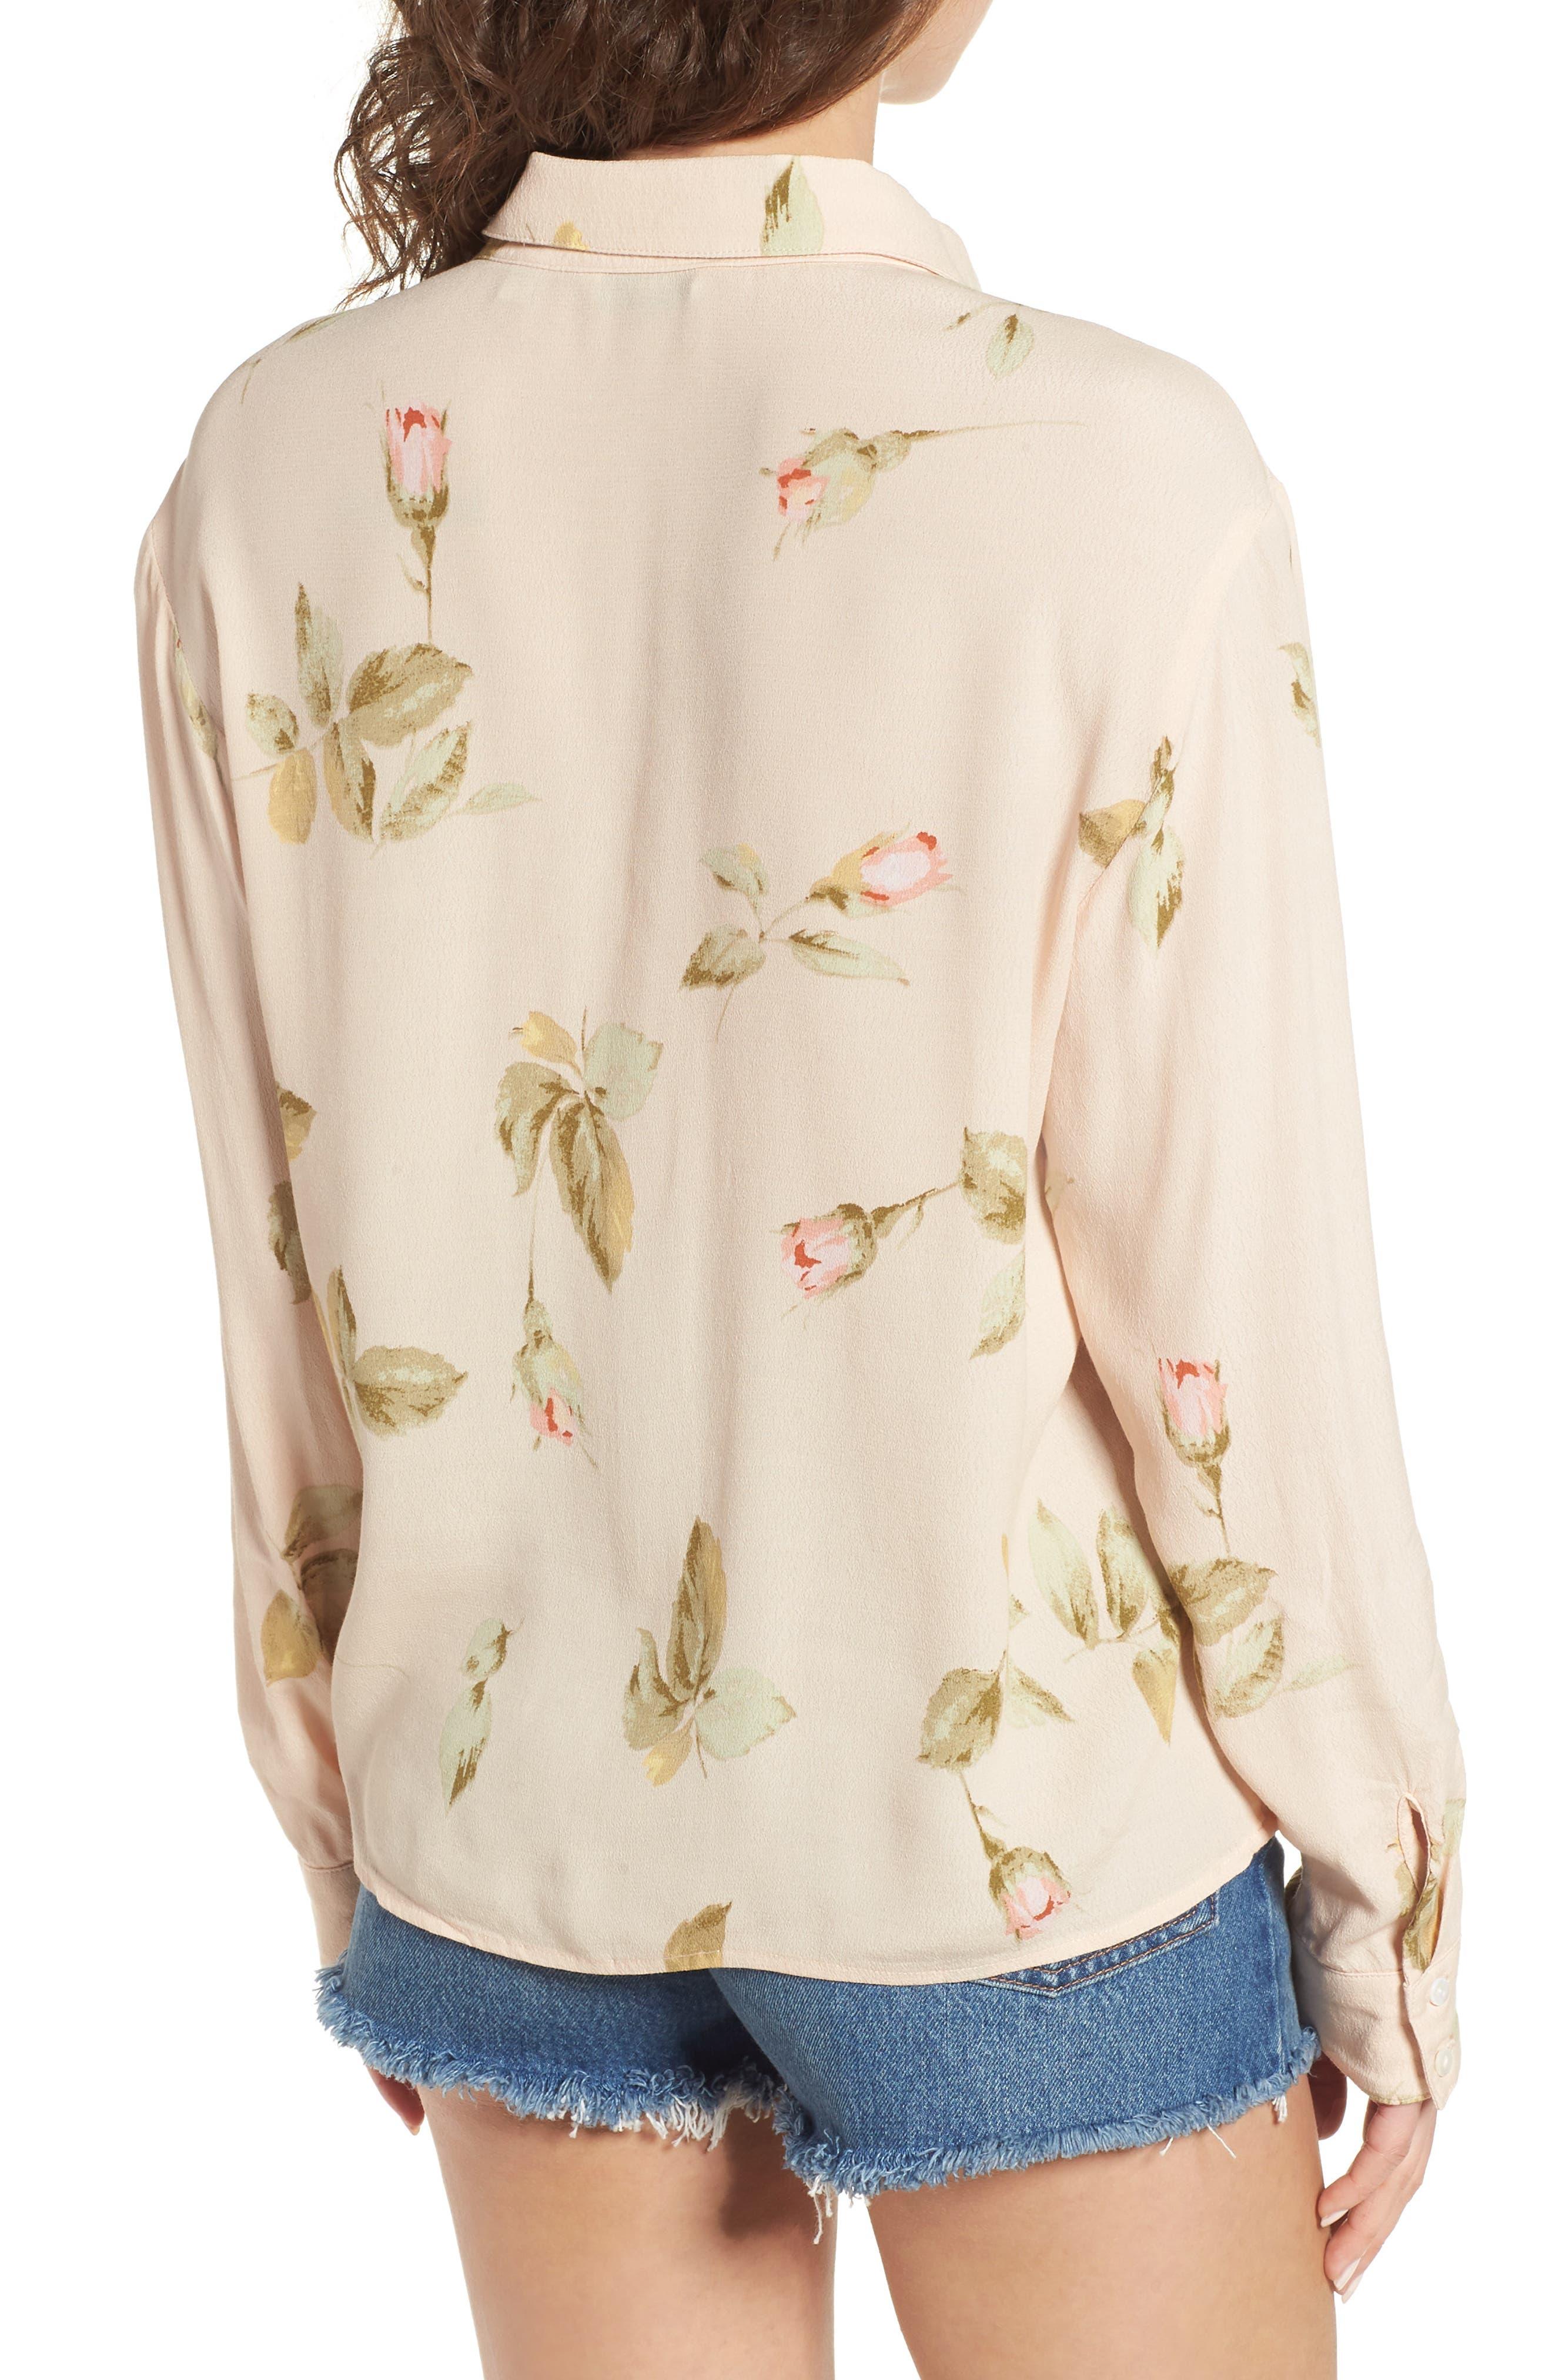 Sinclair Floral Print Shirt,                             Alternate thumbnail 2, color,                             Taupe Multi